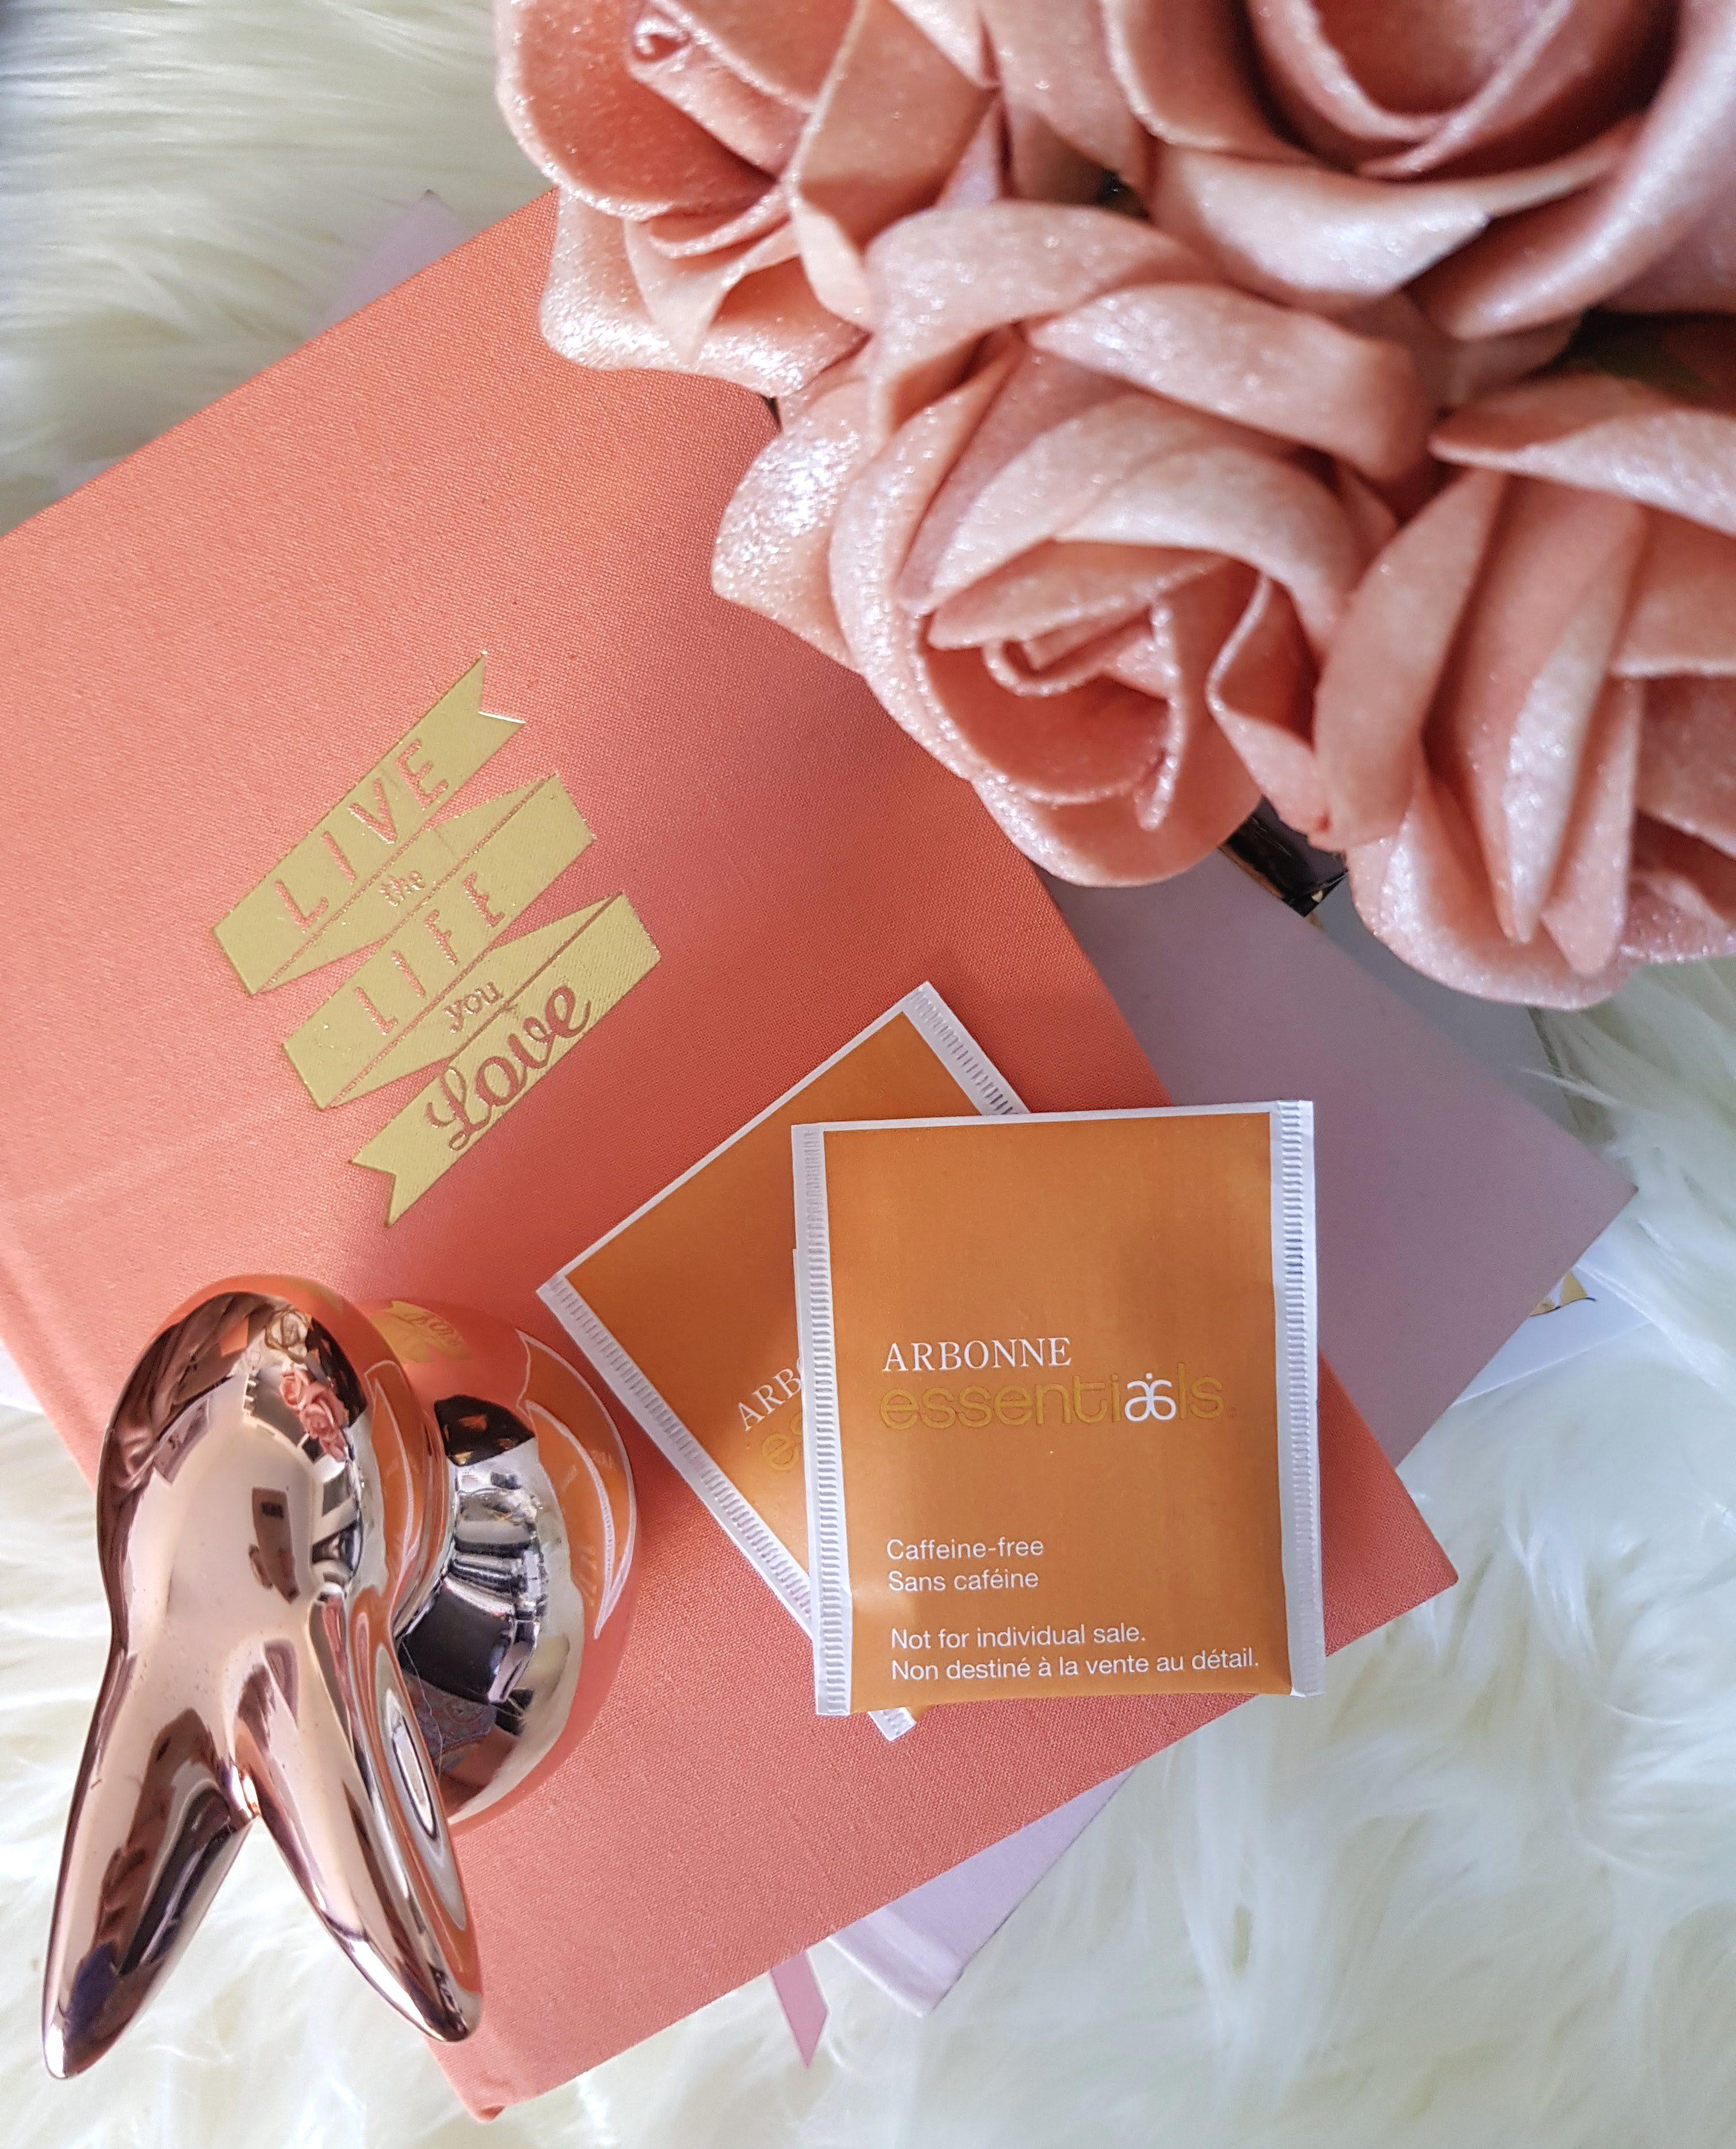 samantha clark hydration sleep look good fashion beauty blog